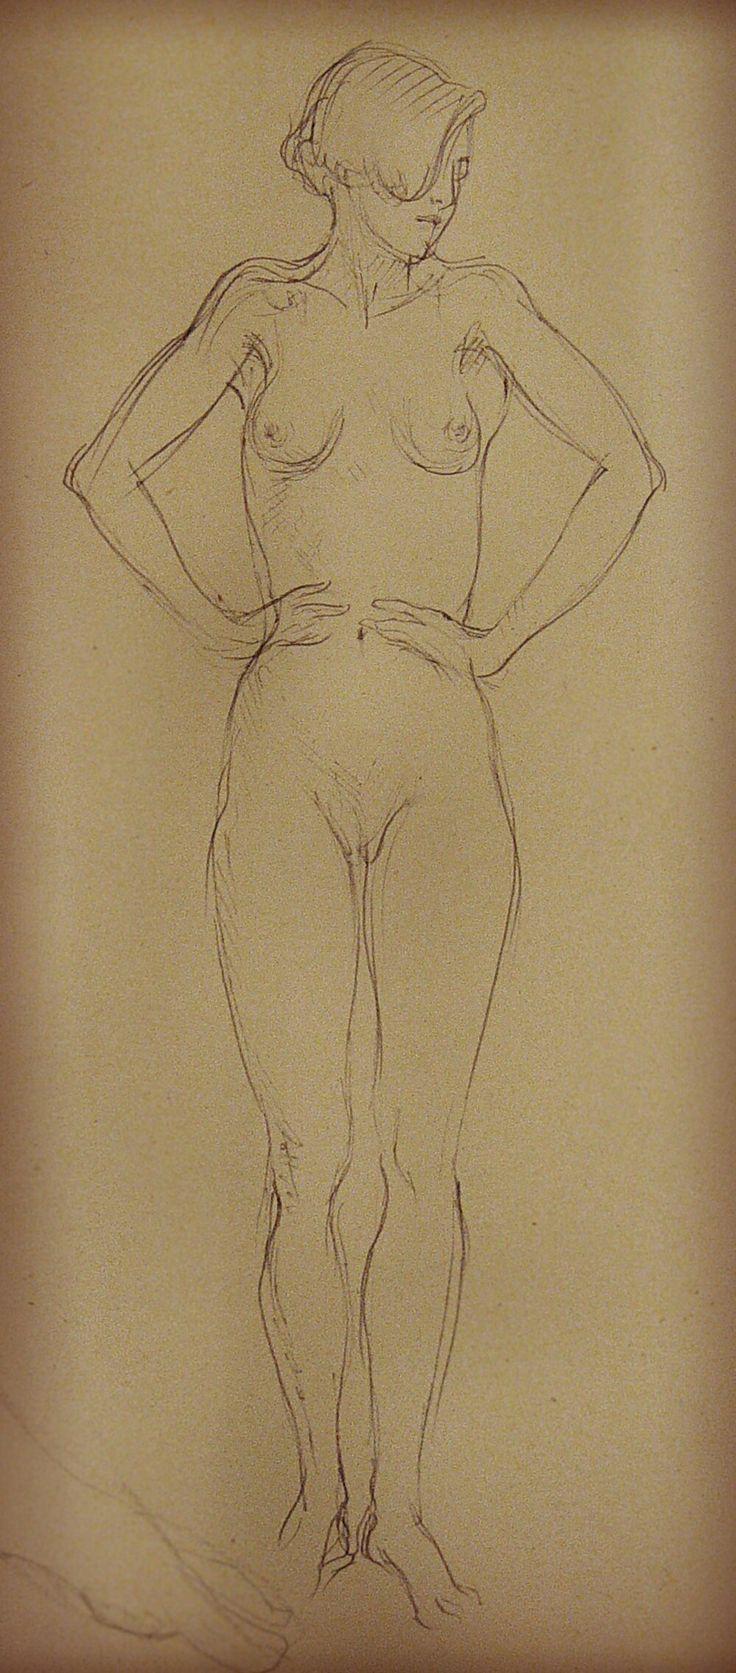 #набросок #обнаженная #grafica #nude #figure #girl #art #Dmitry_Kostylew #dailydraw